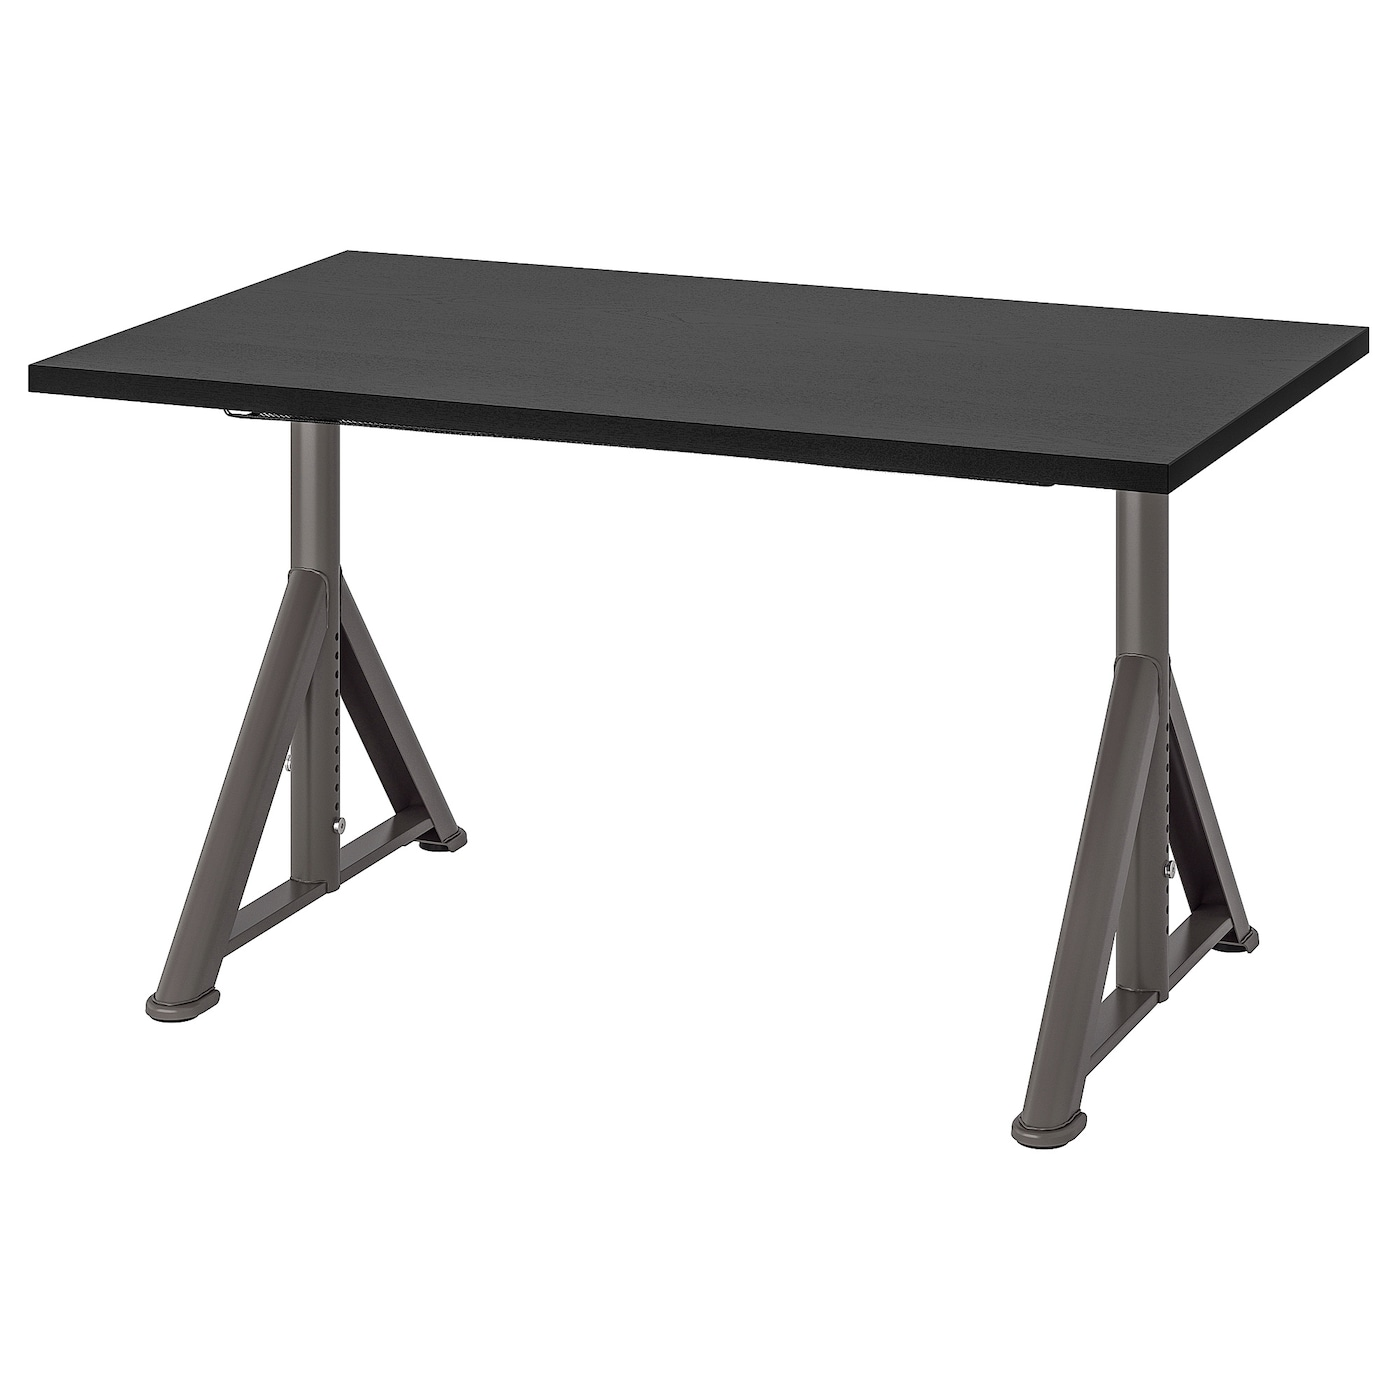 IKEA IDÅSEN Biurko, czarny, ciemnoszary, 120x70 cm